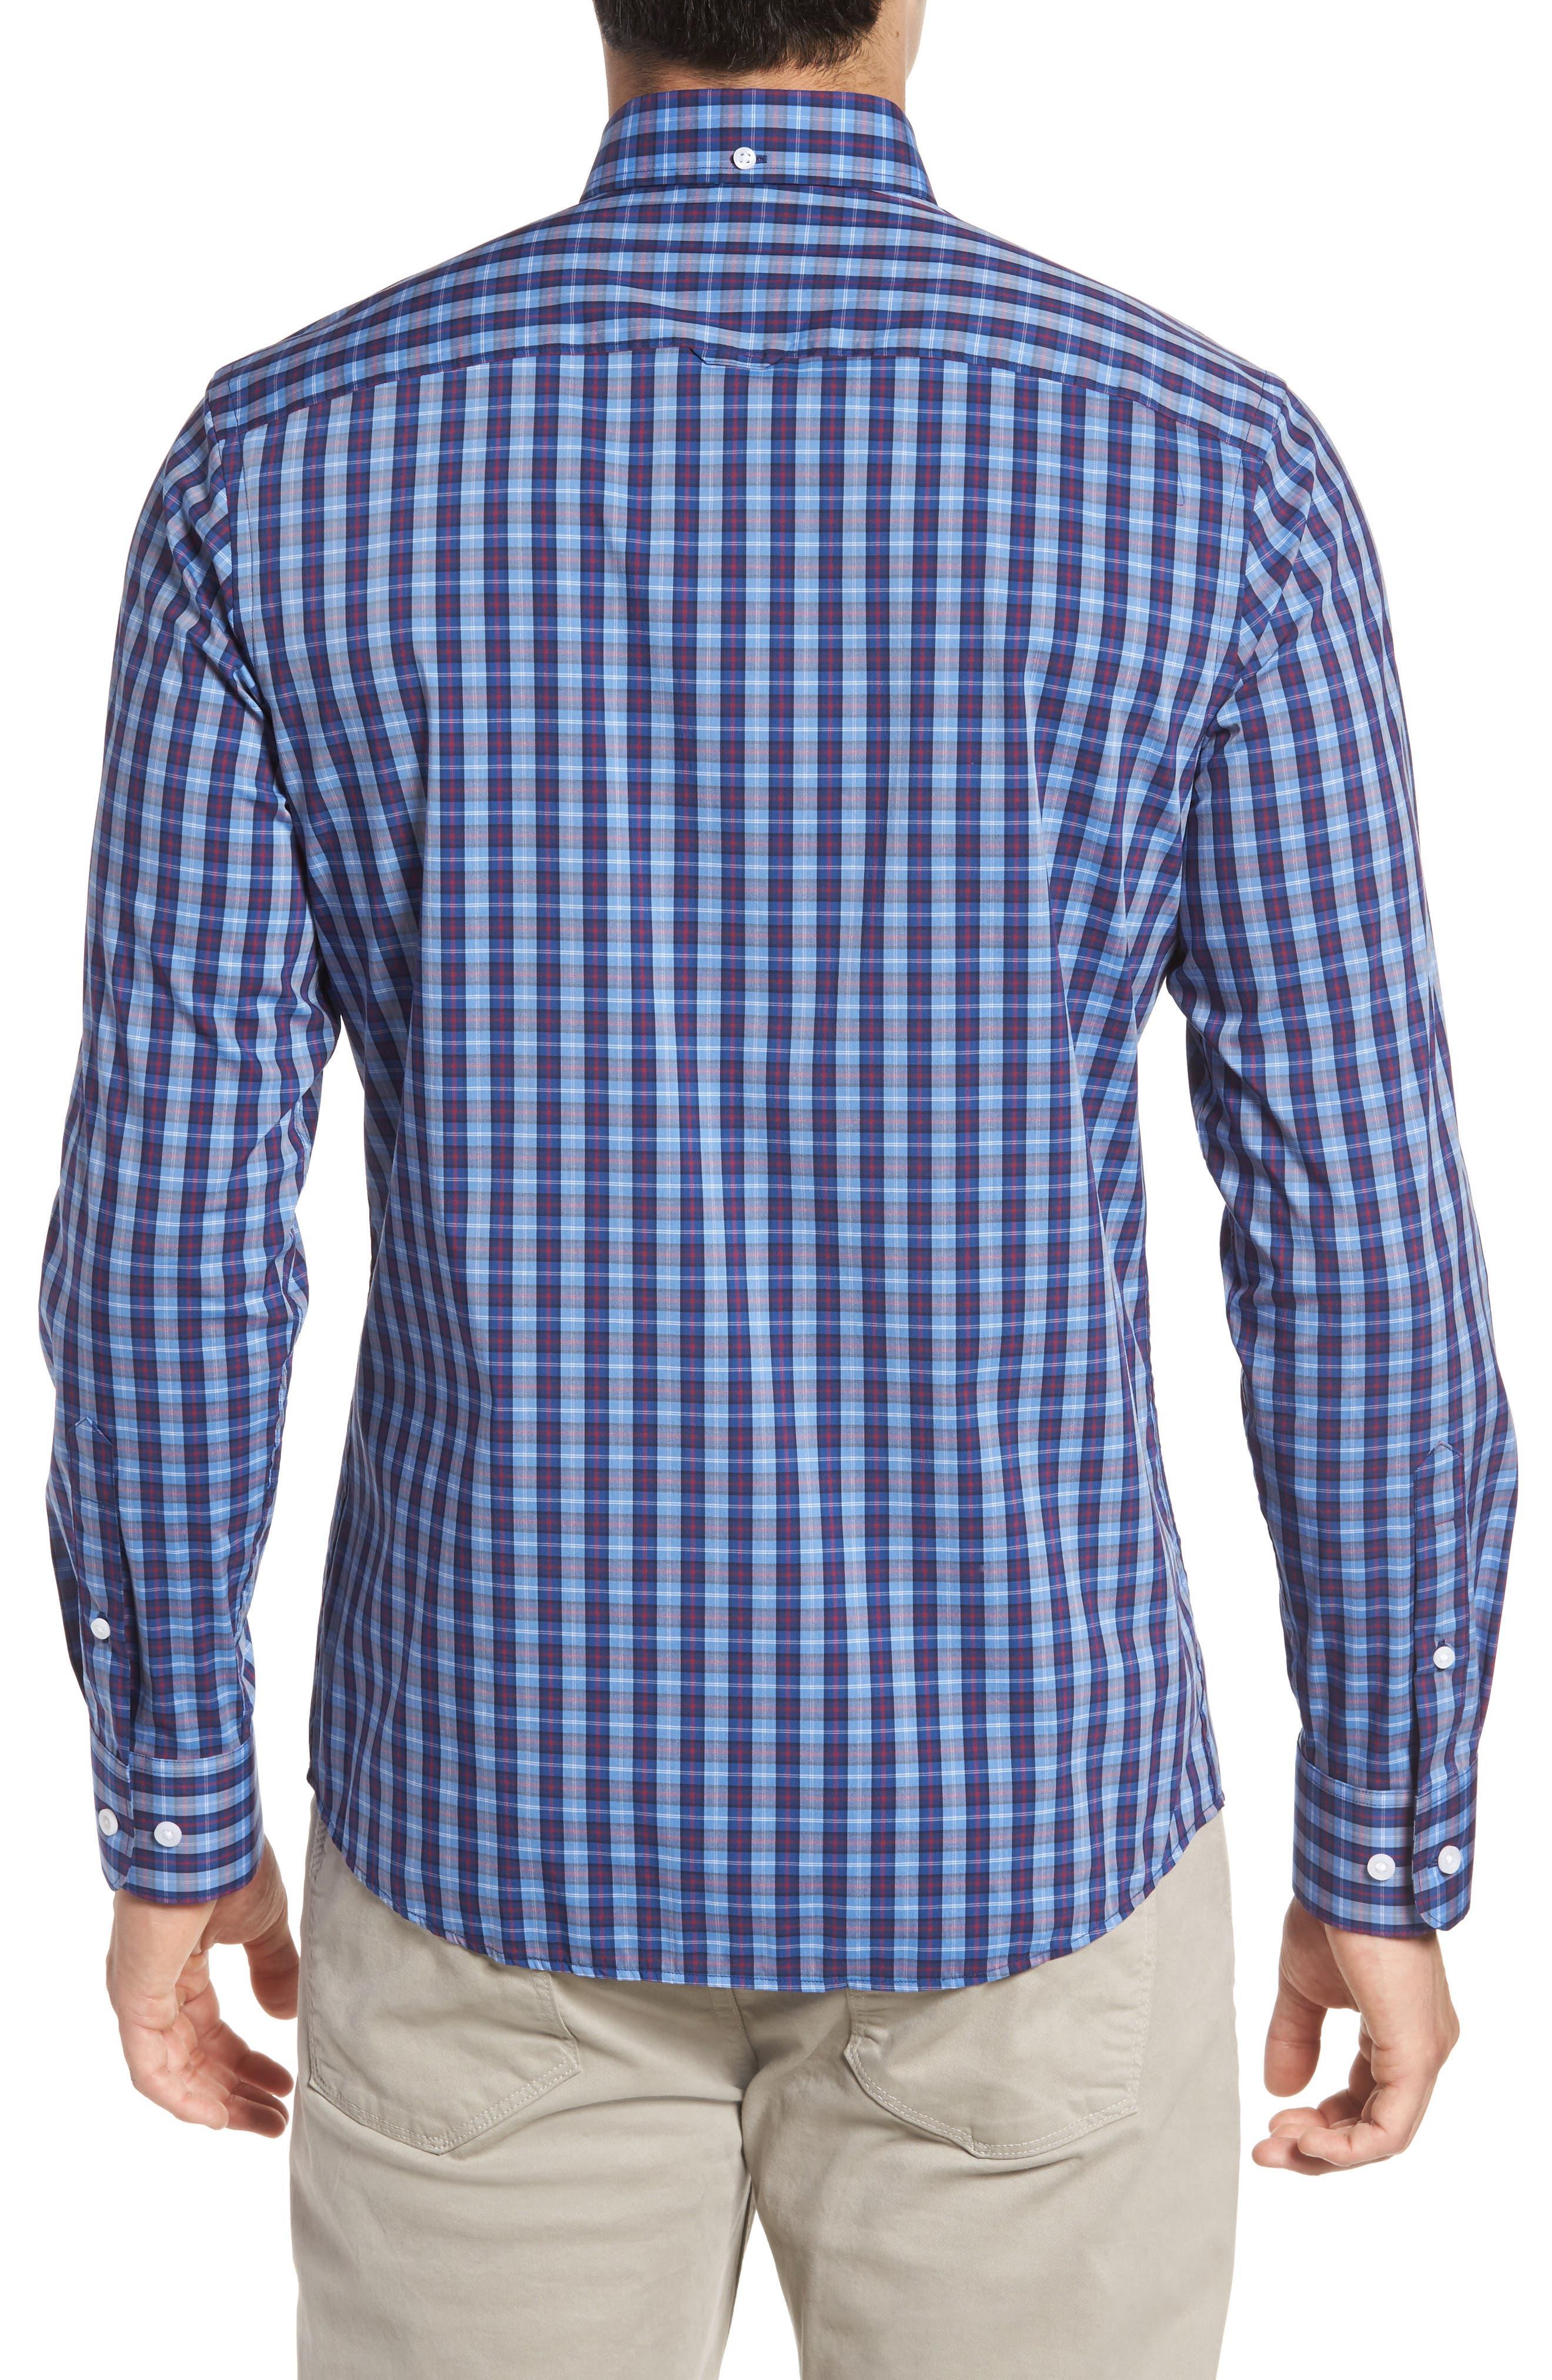 Alternate Image 2  - Nordstrom Men's Shop Trim Fit Tech-Smart Plaid Sport Shirt (Regular & Tall)